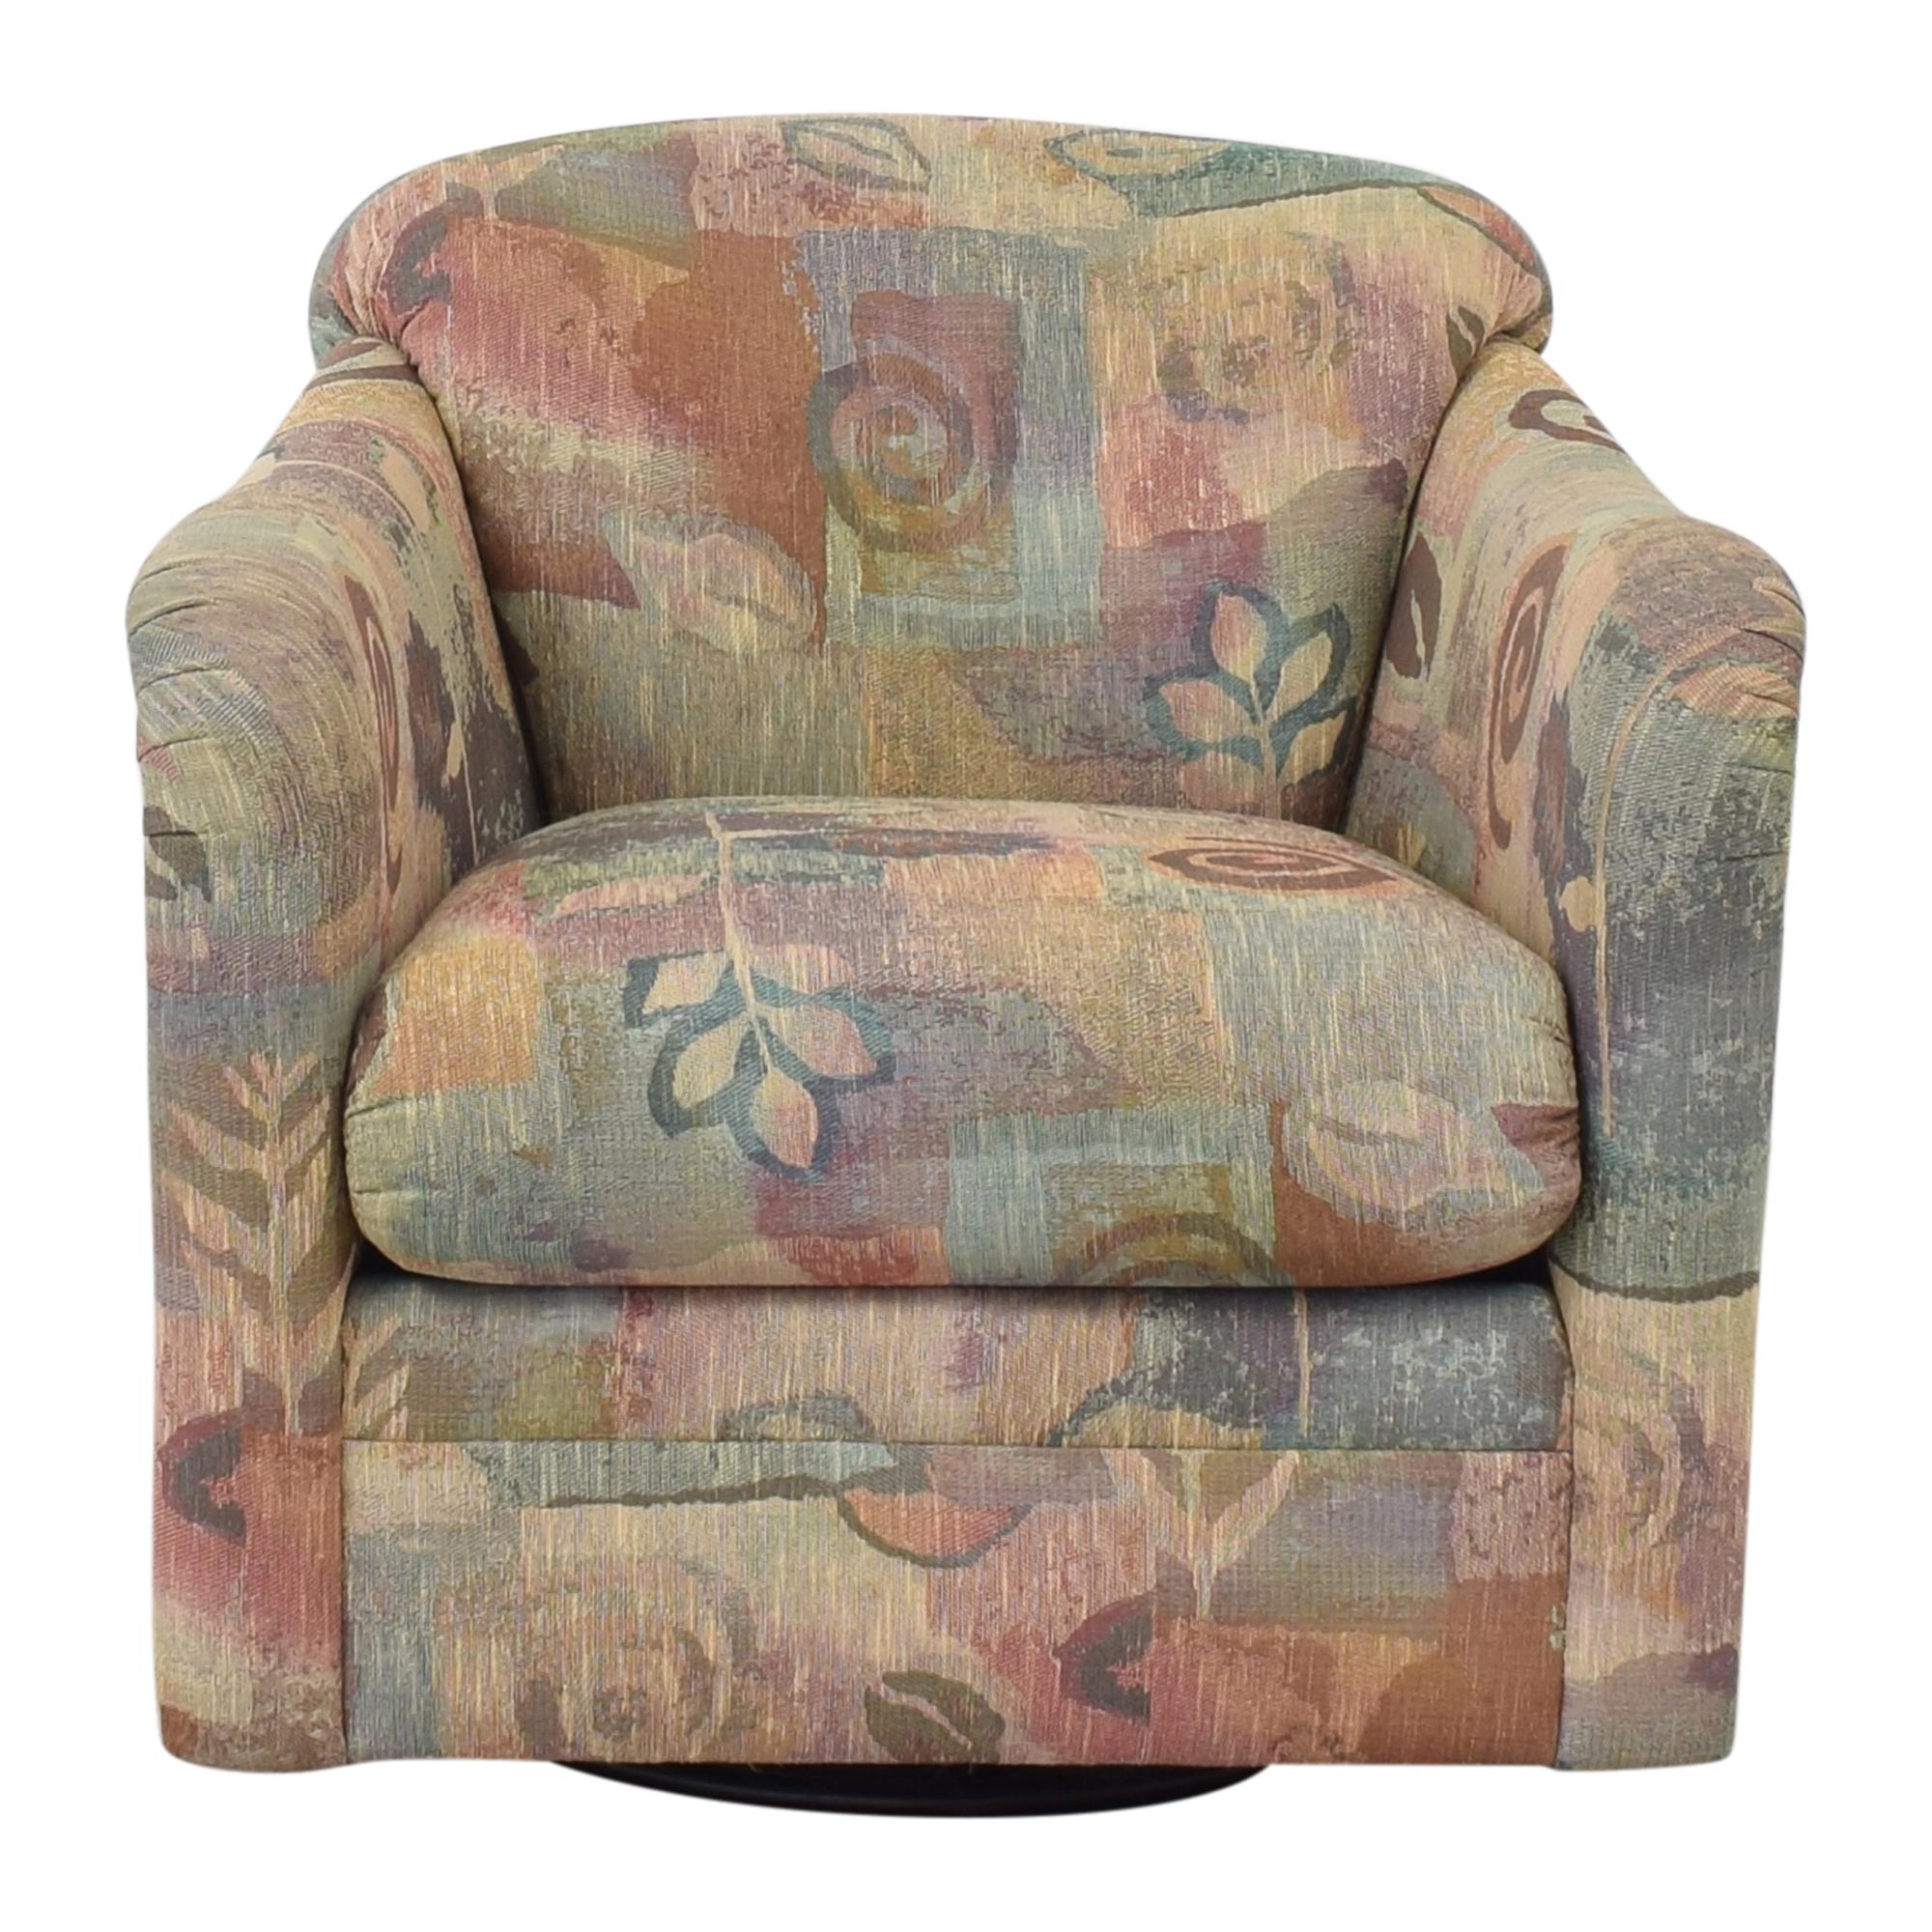 Precedent Furniture Precedent Furniture Patterned Swivel Chair pa